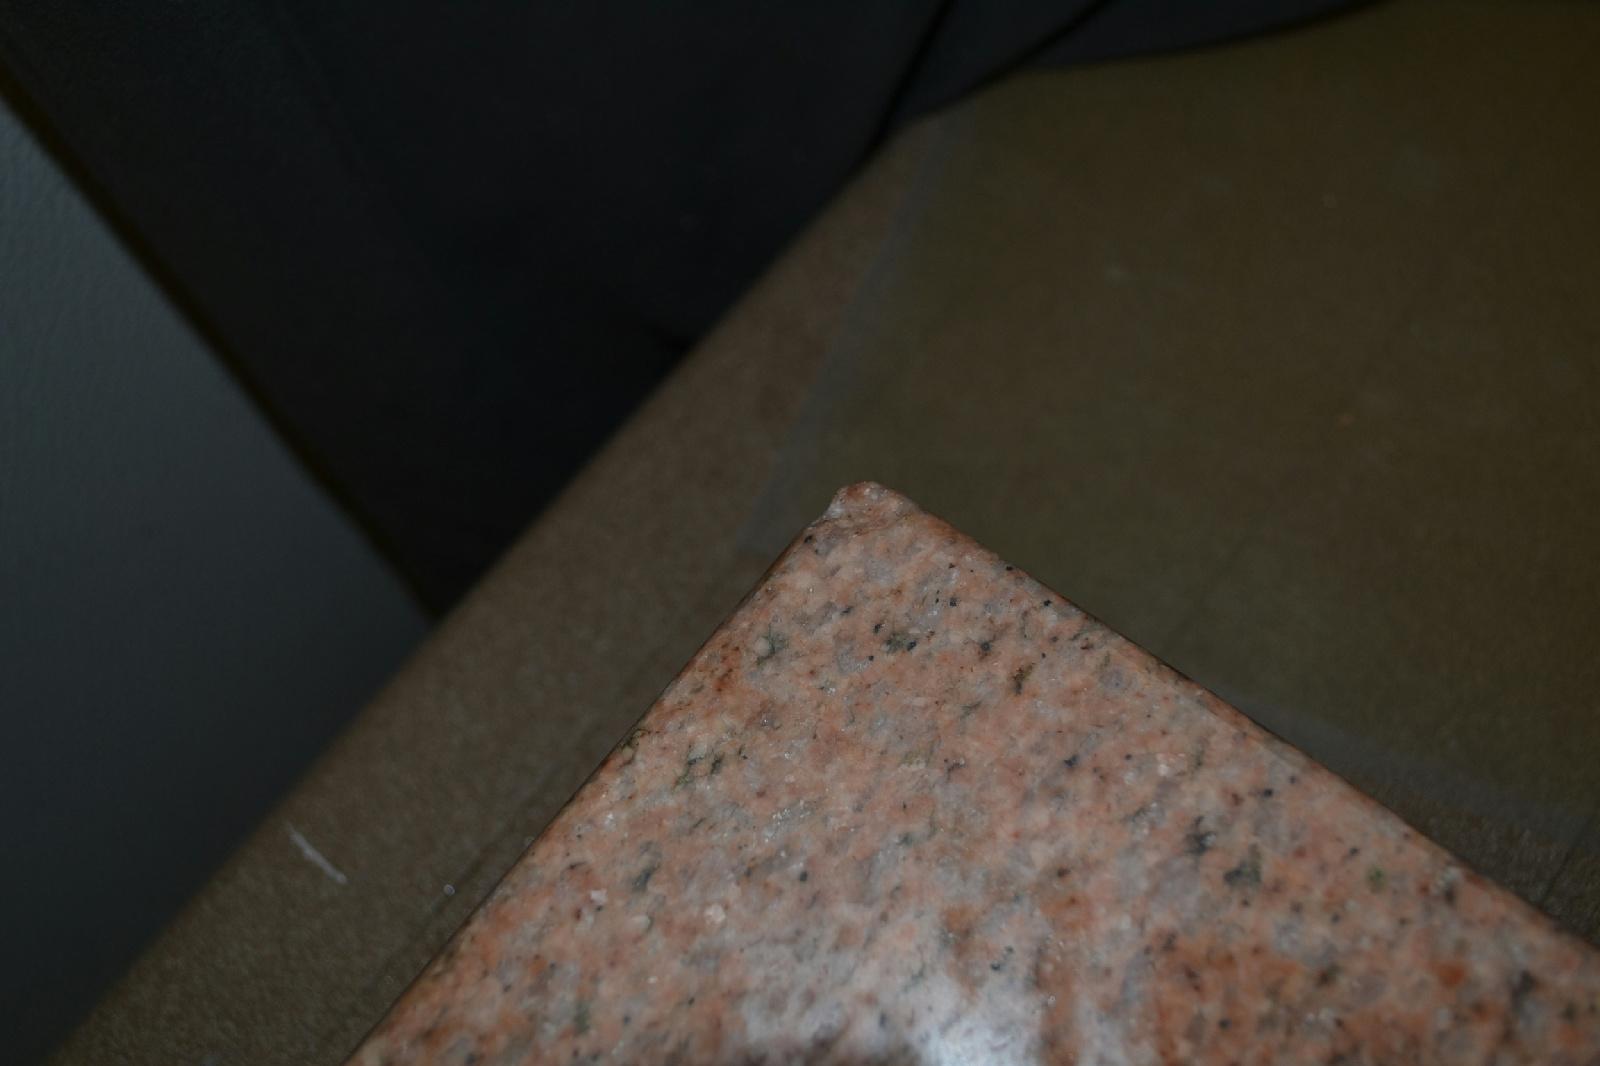 Starrett Crystal Pink Granite Surface Inspection Plate